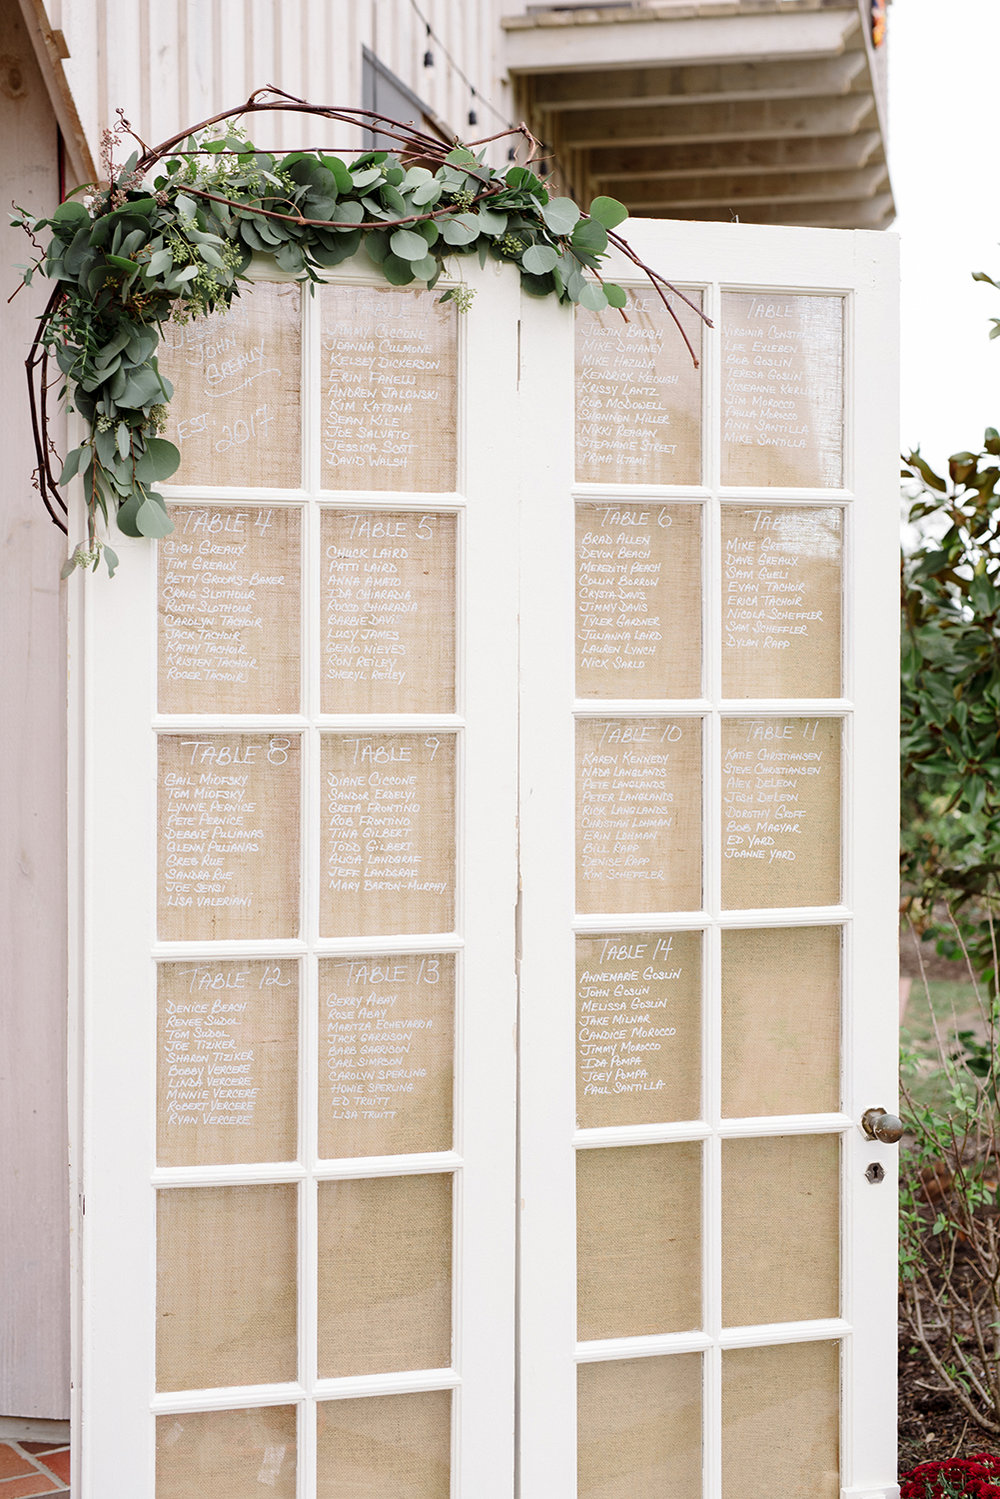 Jess+John- Edel Haus Alpaca Farm Wedding- Glass Door Seating Chart- Wall New Jersey- Olivia Christina Photo-1.JPG